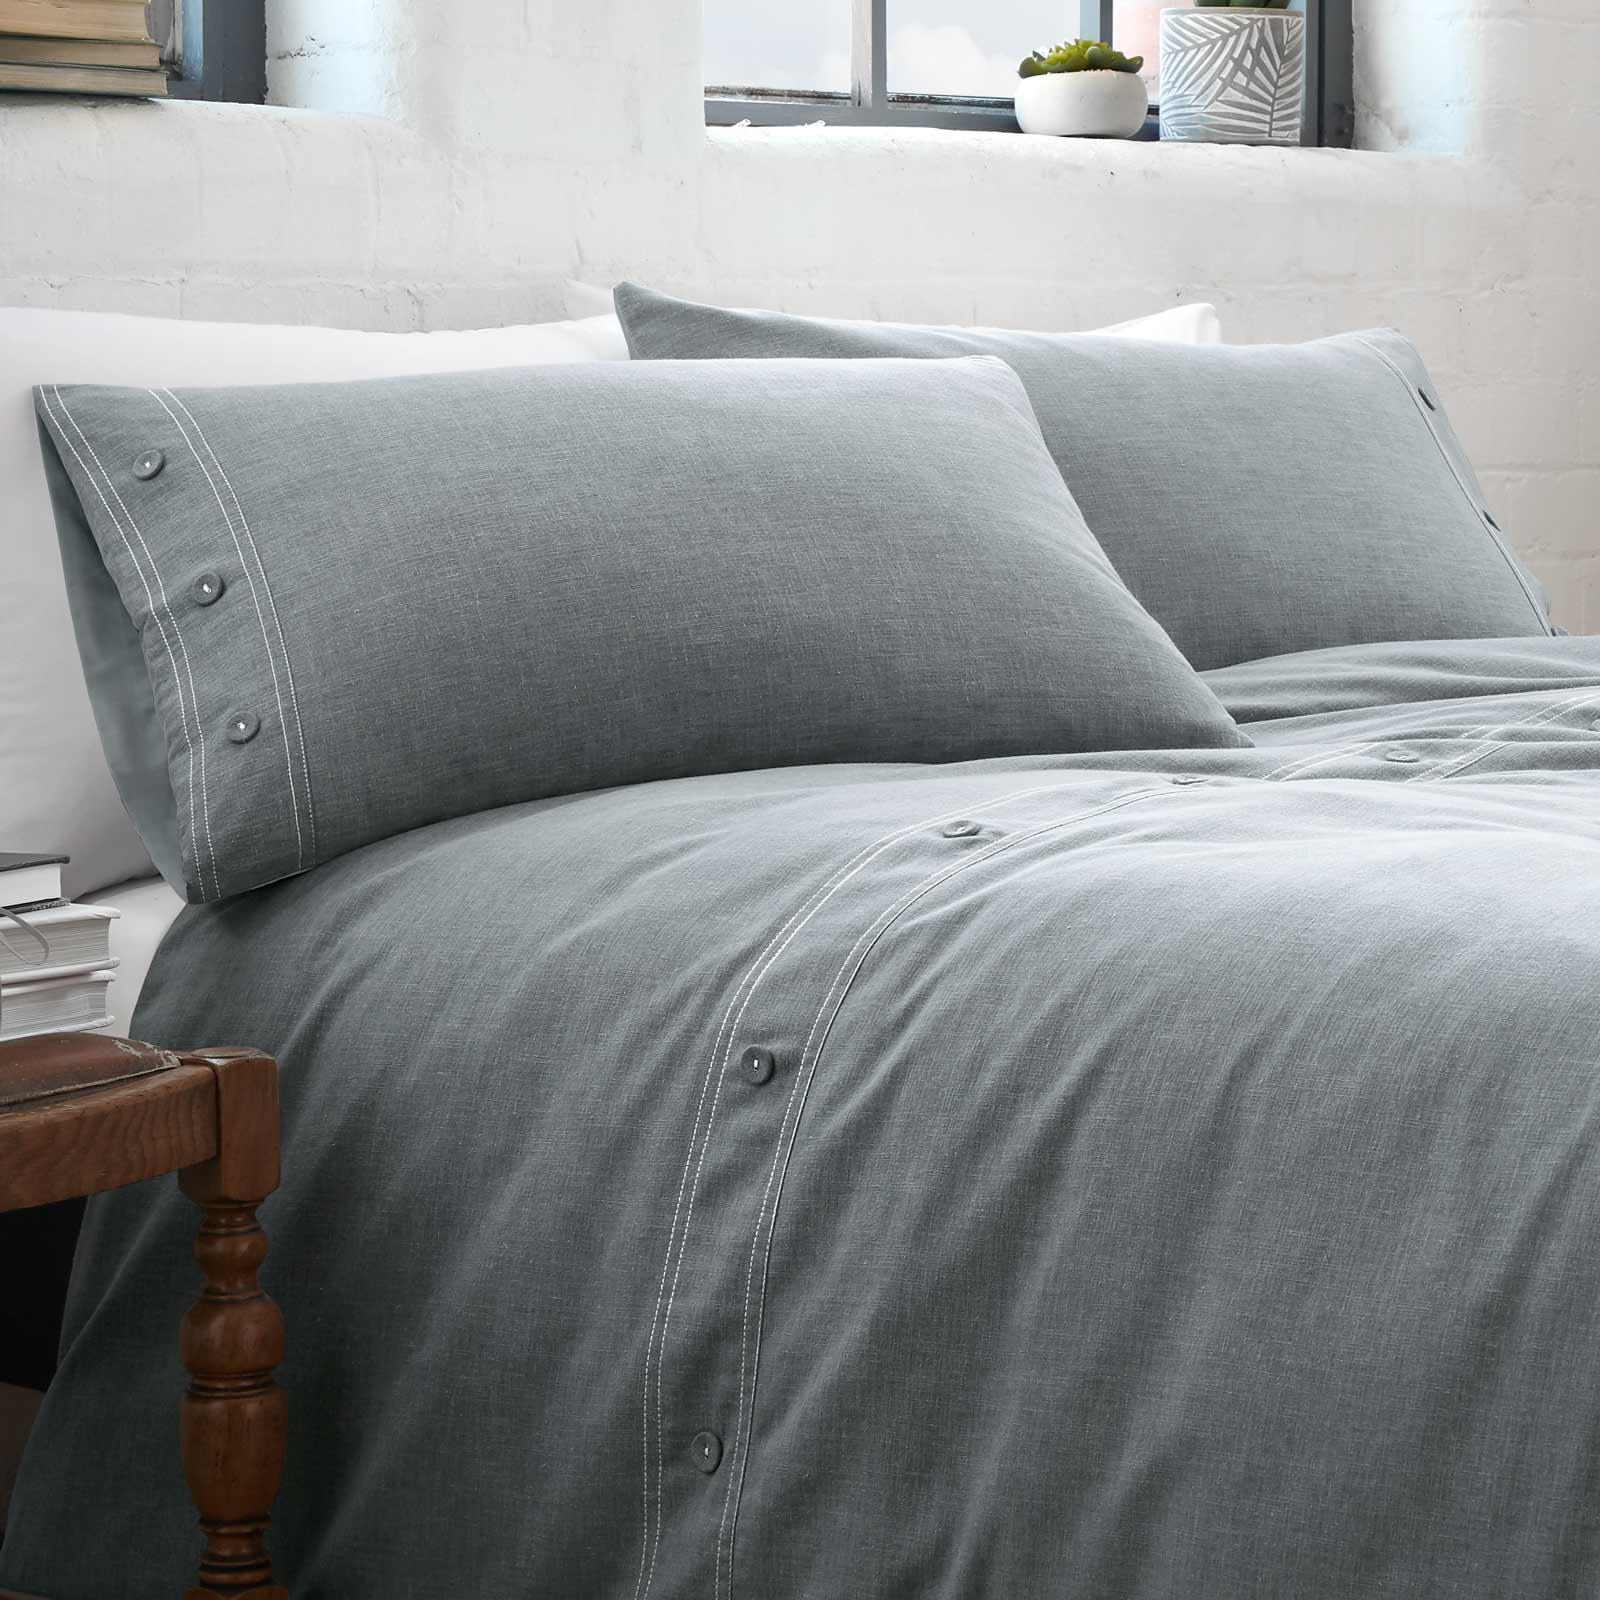 Azul-fundas-nordicas-Denim-Chambray-Boton-Detalle-de-lujo-cubierta-del-edredon-conjuntos-de-cama miniatura 9